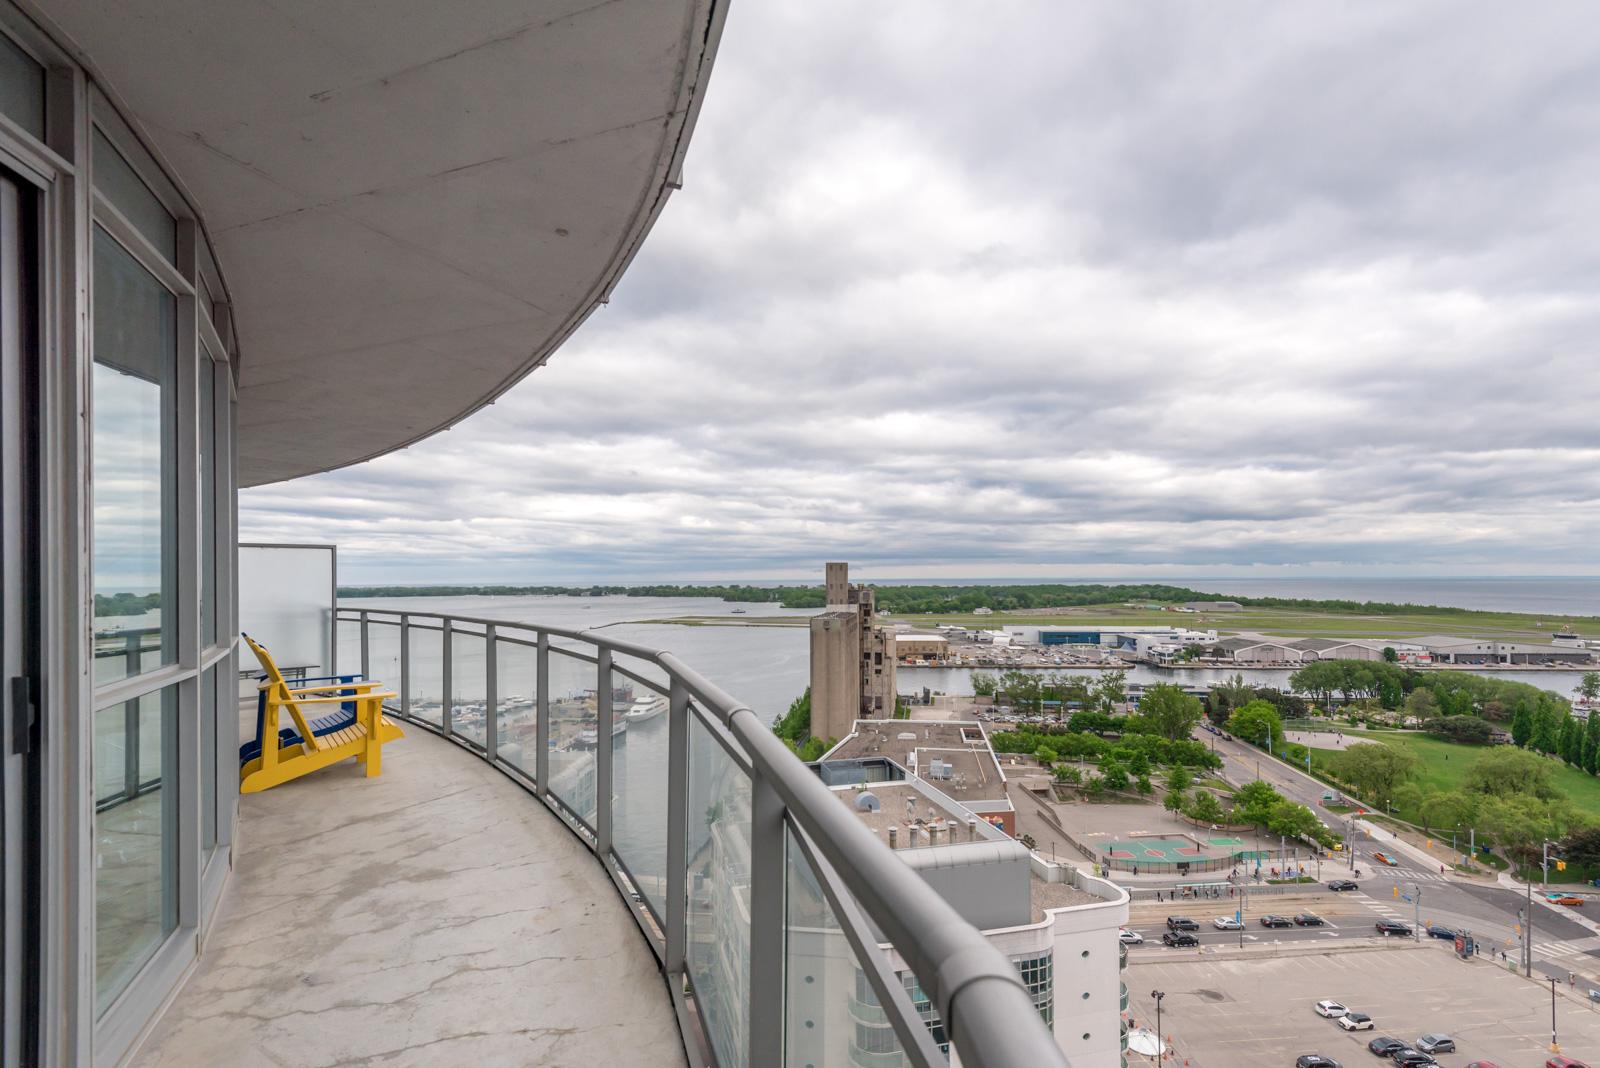 Image of balcony and Lake Ontario.